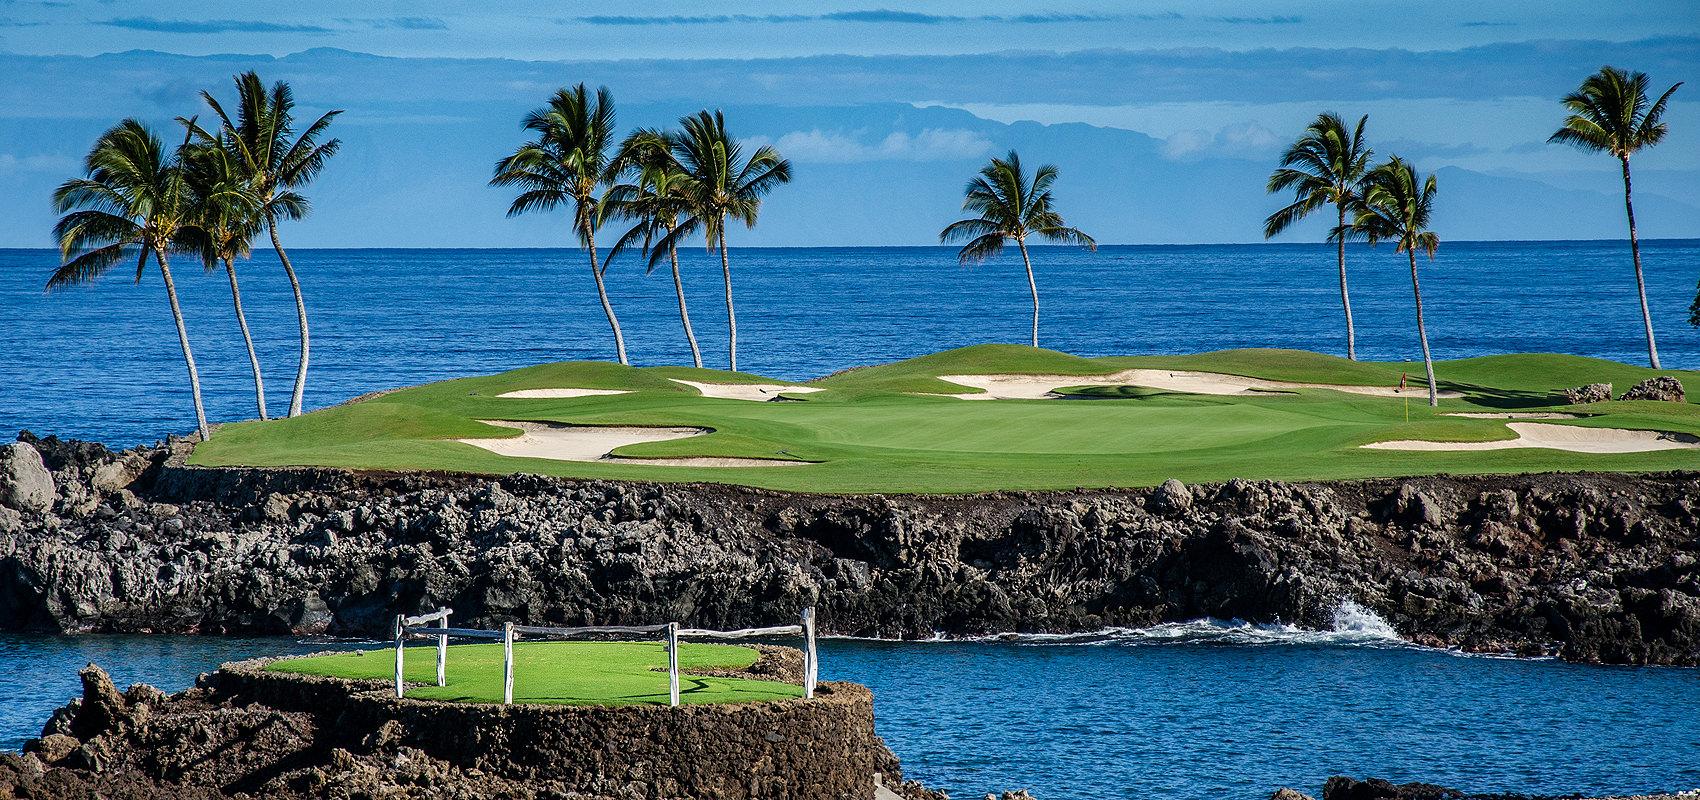 Big Island & Waikiki Hawaii ladies golf tour